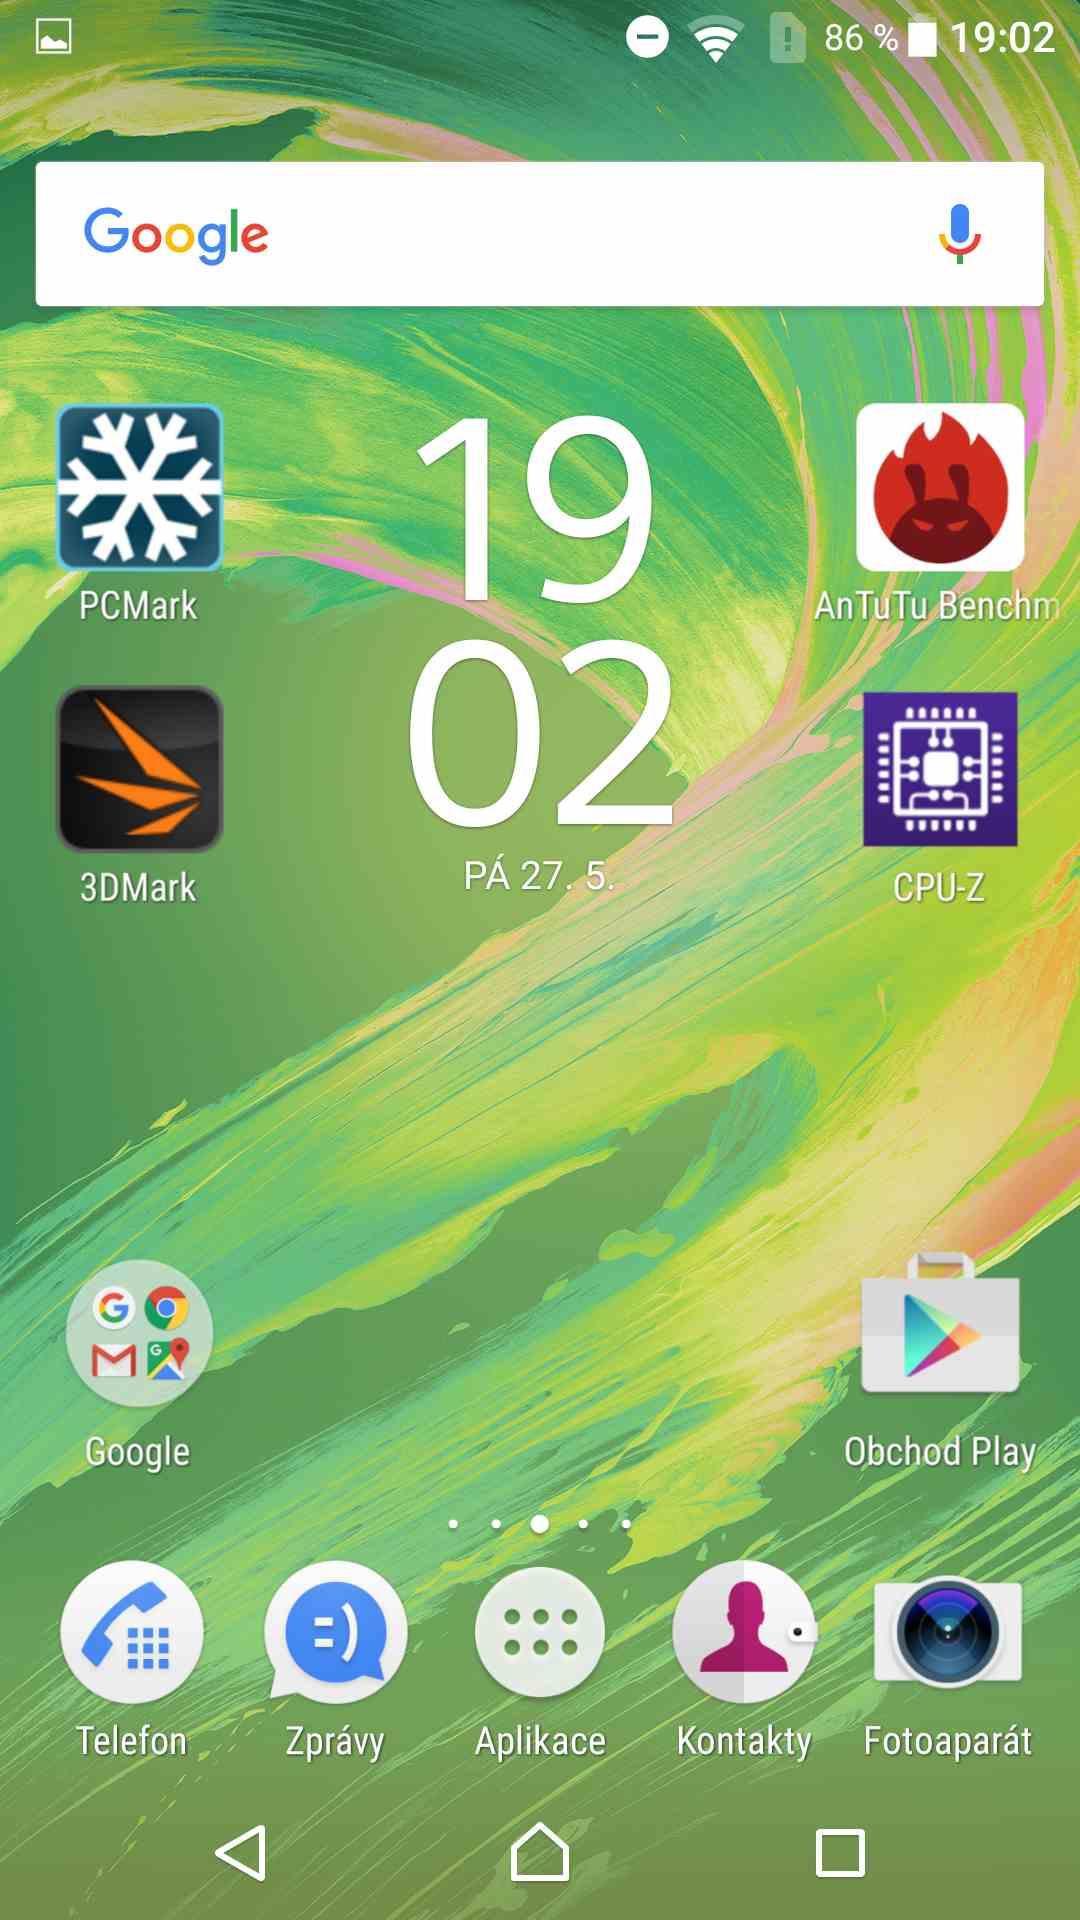 web-screen-sony-xperia-x